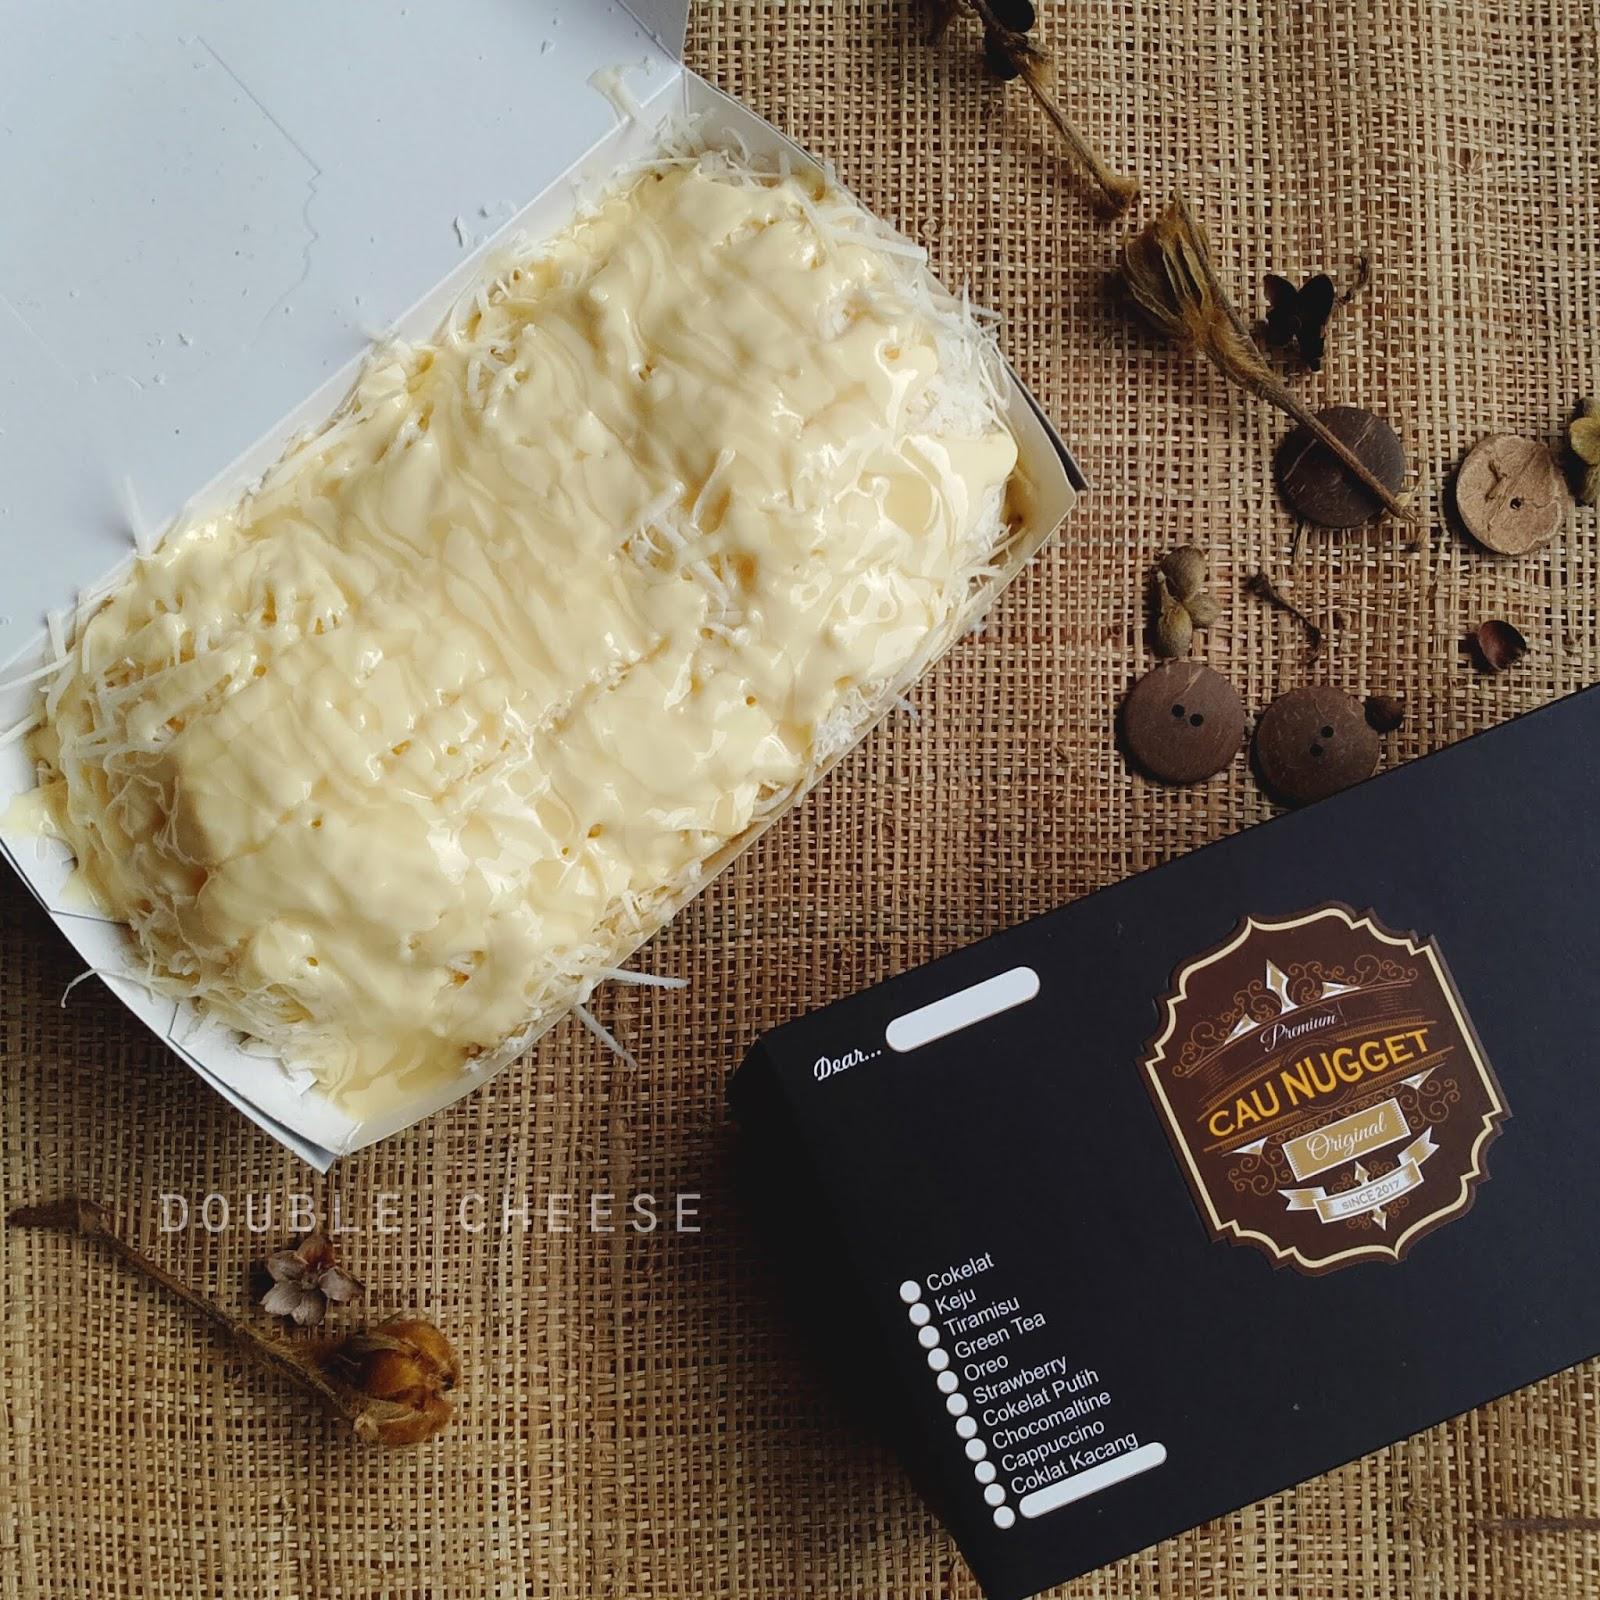 Harga Jual Chocomaltine Tiramisu Update 2018 Comport Carpet Karpet Mercy C180 Sport Premium 2cm Cau Nugget Pisang Bandung Double Cheese